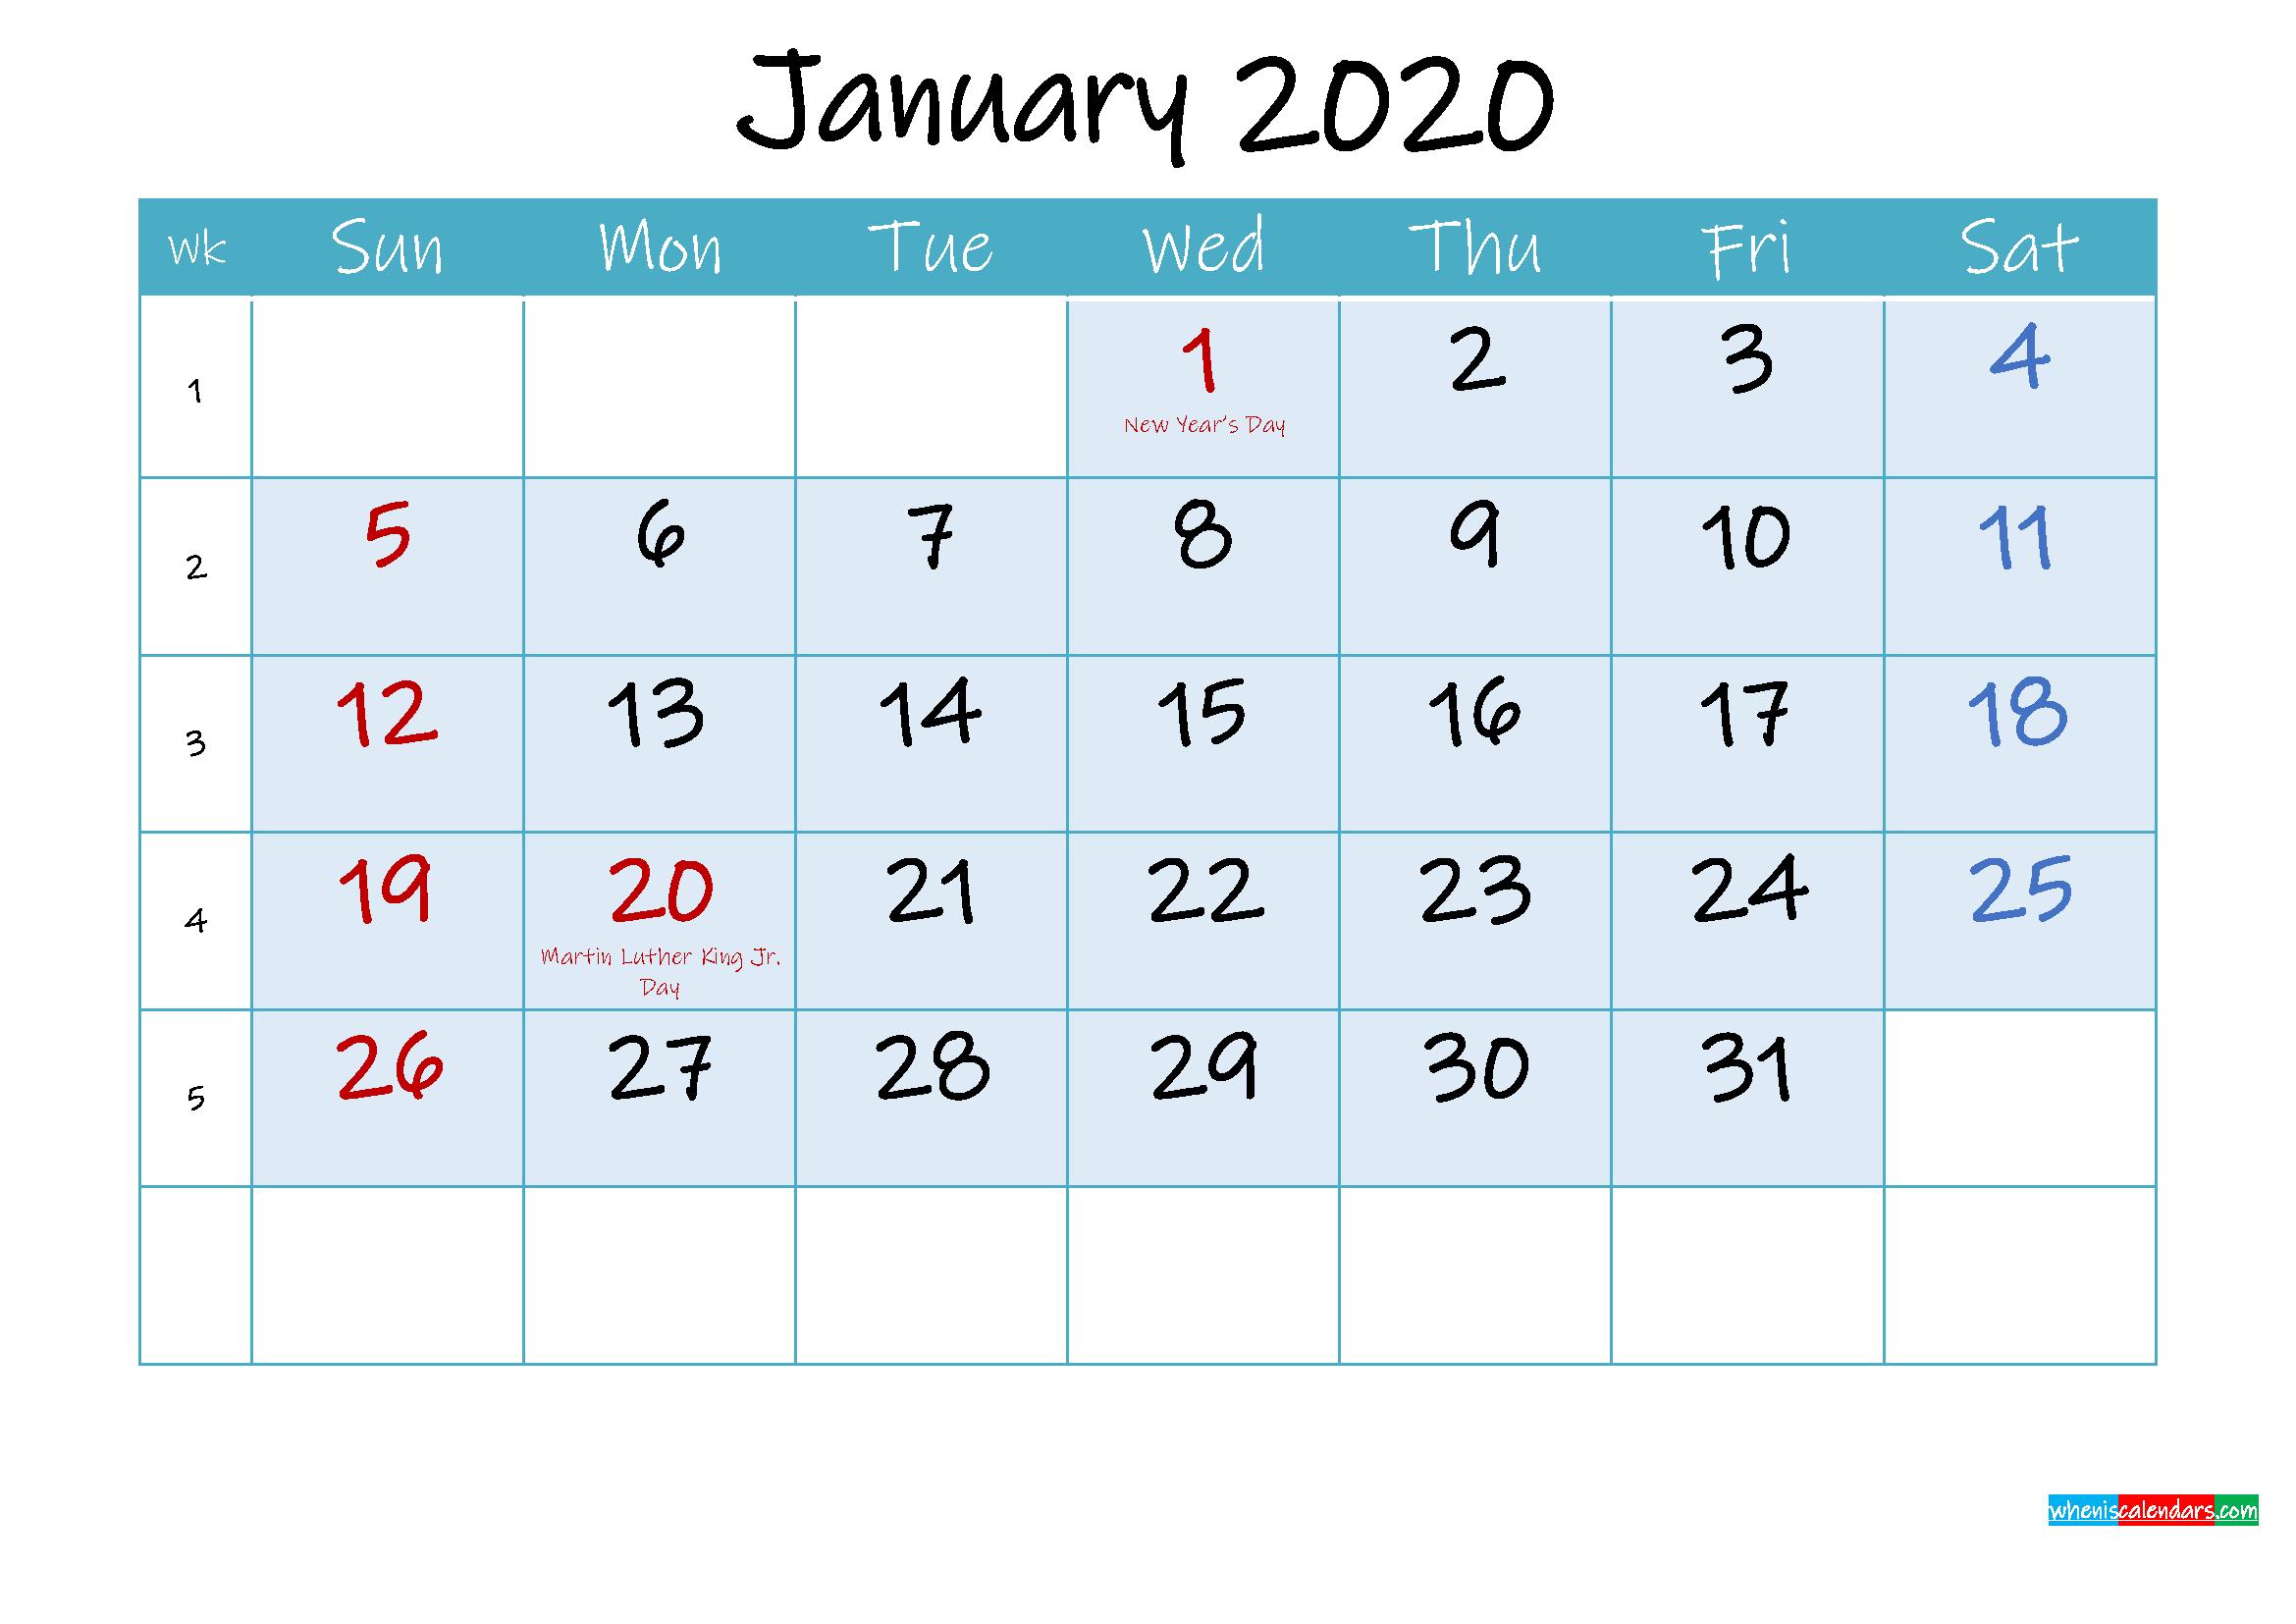 January 2020 Free Printable Calendar with Holidays